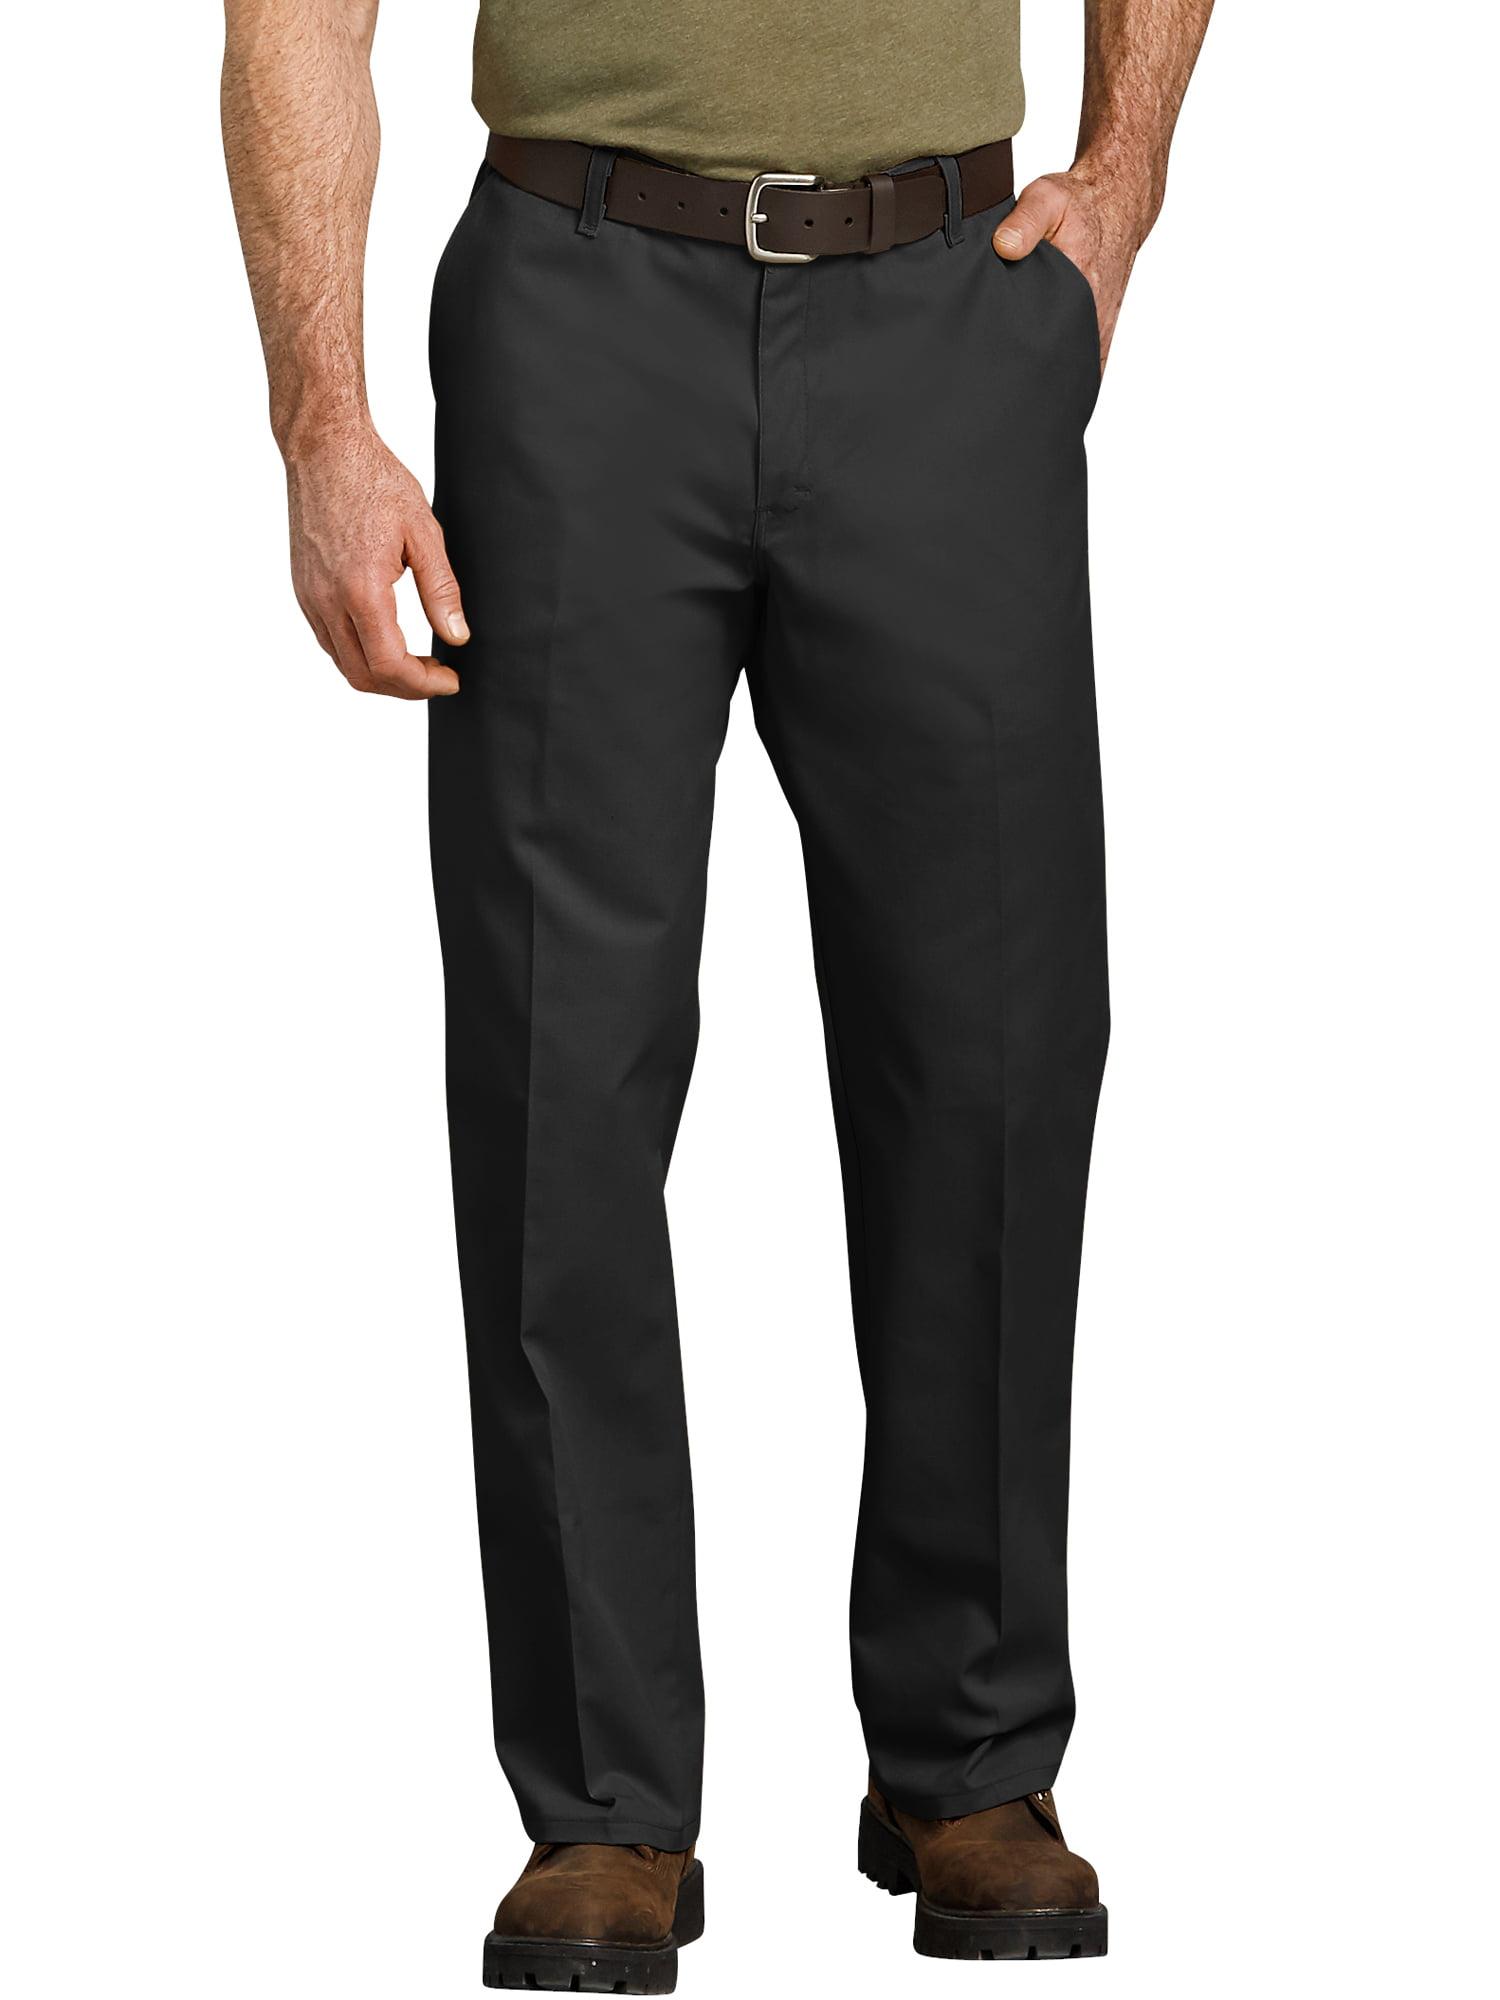 Men's Relaxed Fit Straight Leg Flat Front Flex Pant